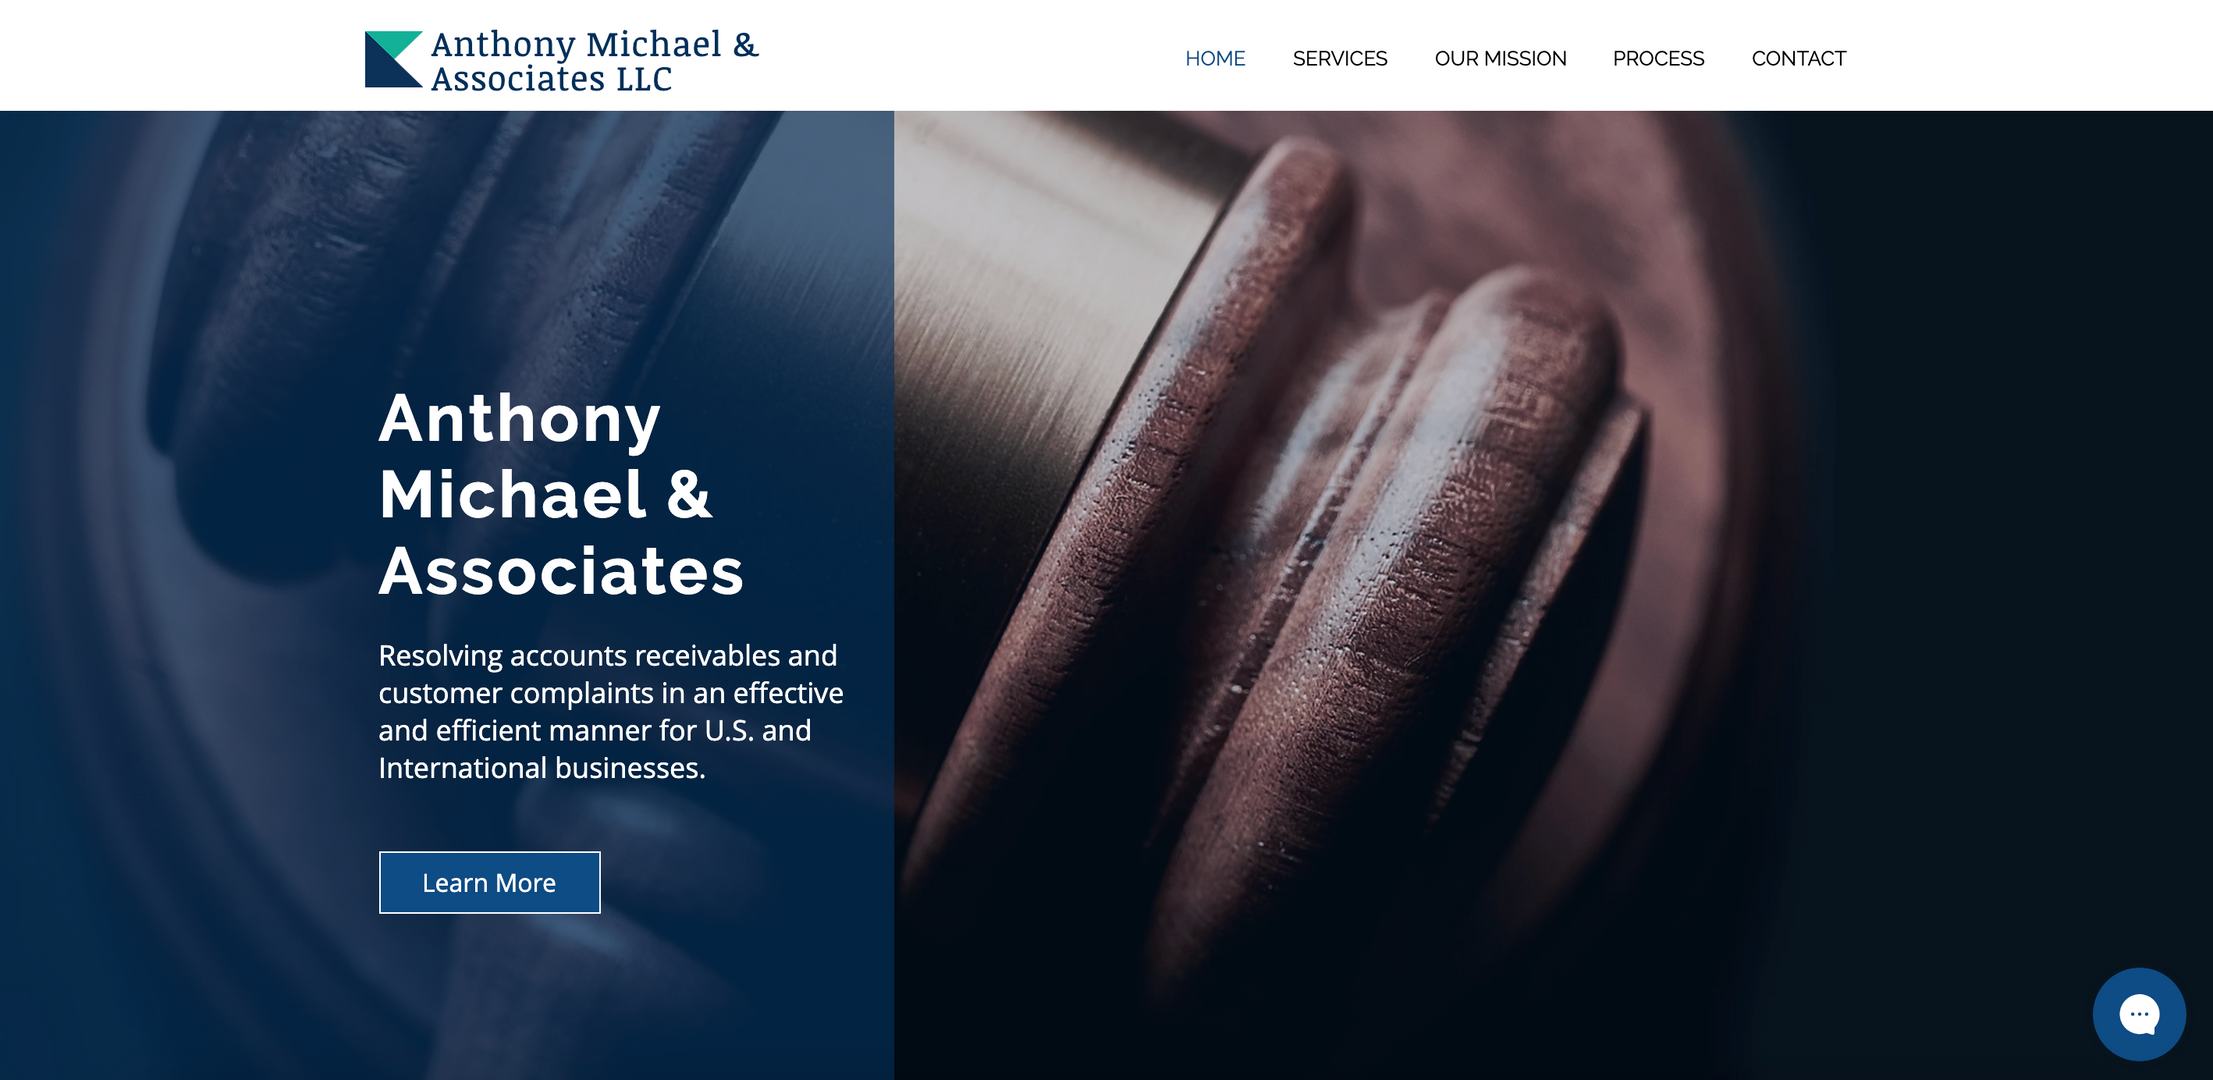 Anthony Michael & Associates